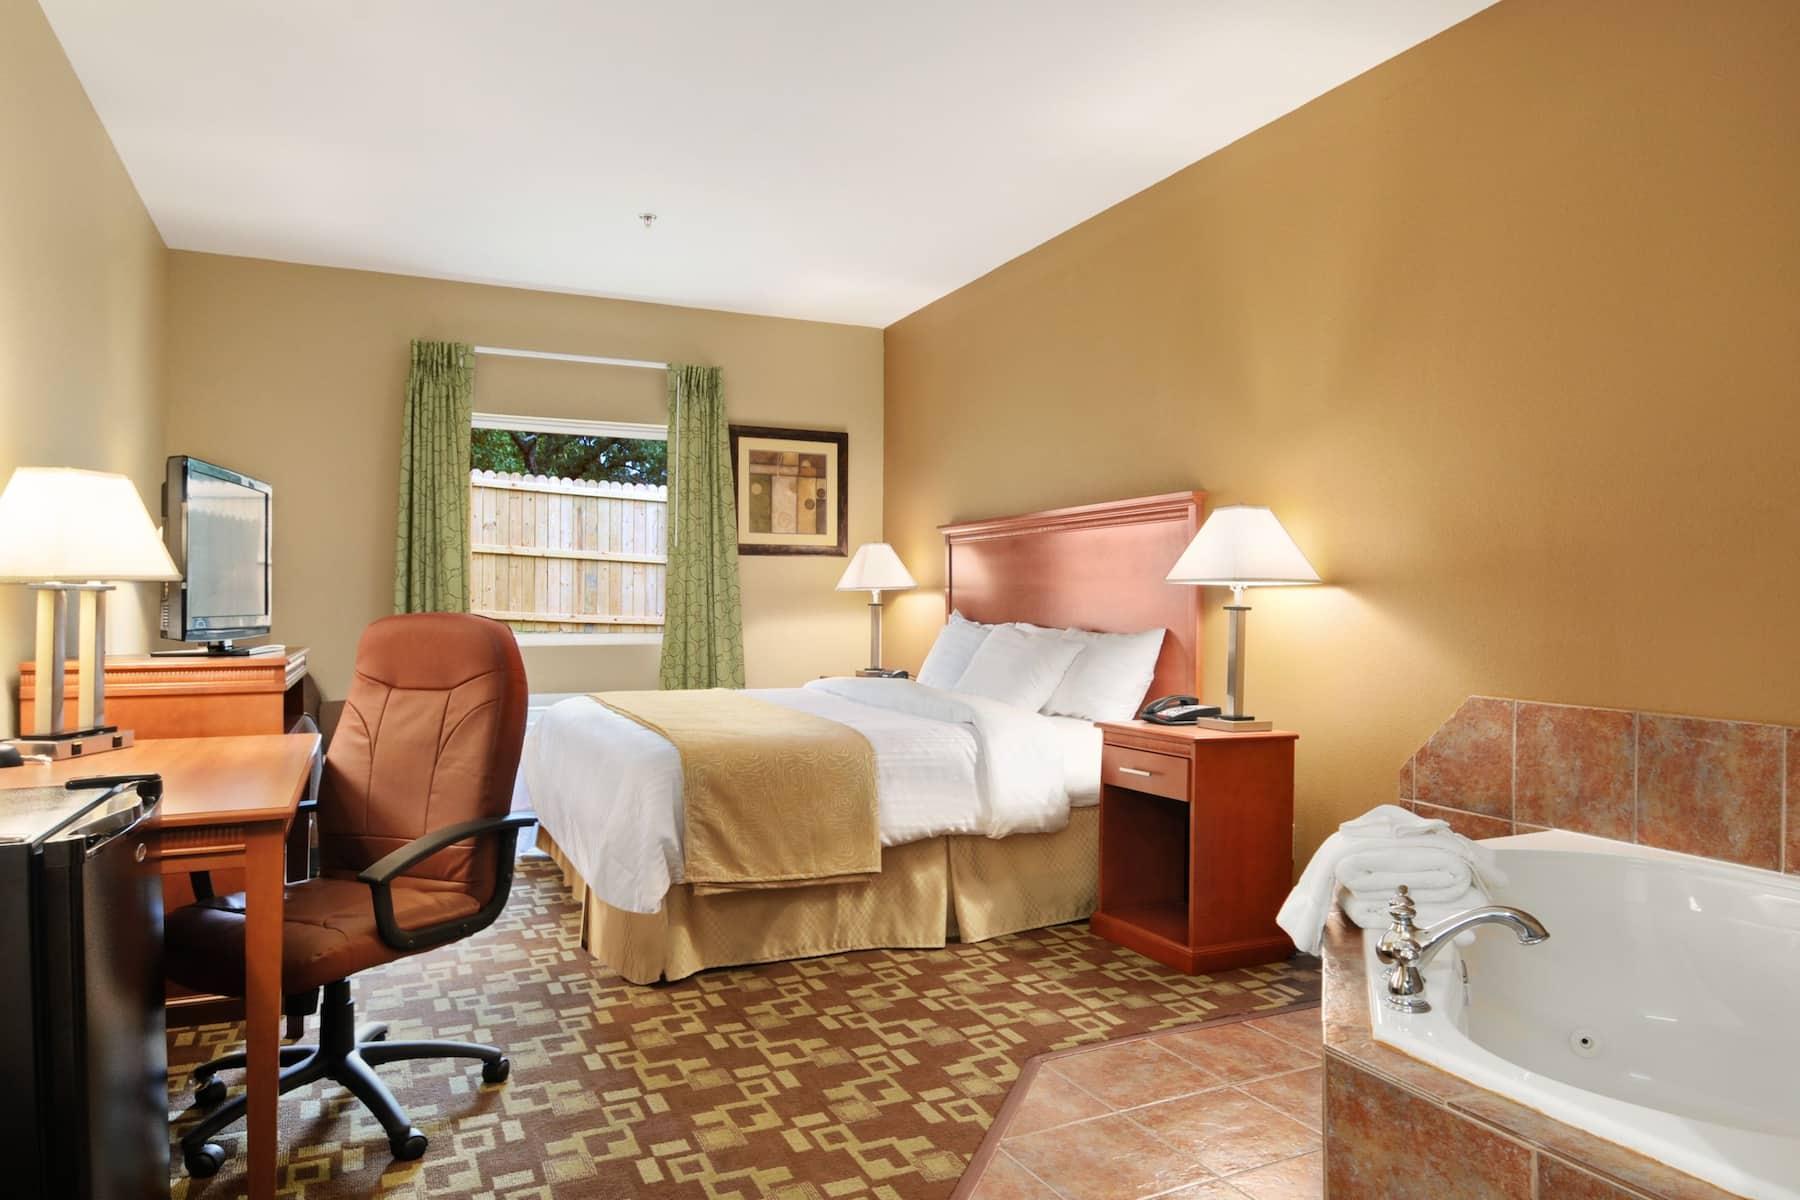 Days Inn & Suites by Wyndham Cabot suite in Cabot, Arkansas